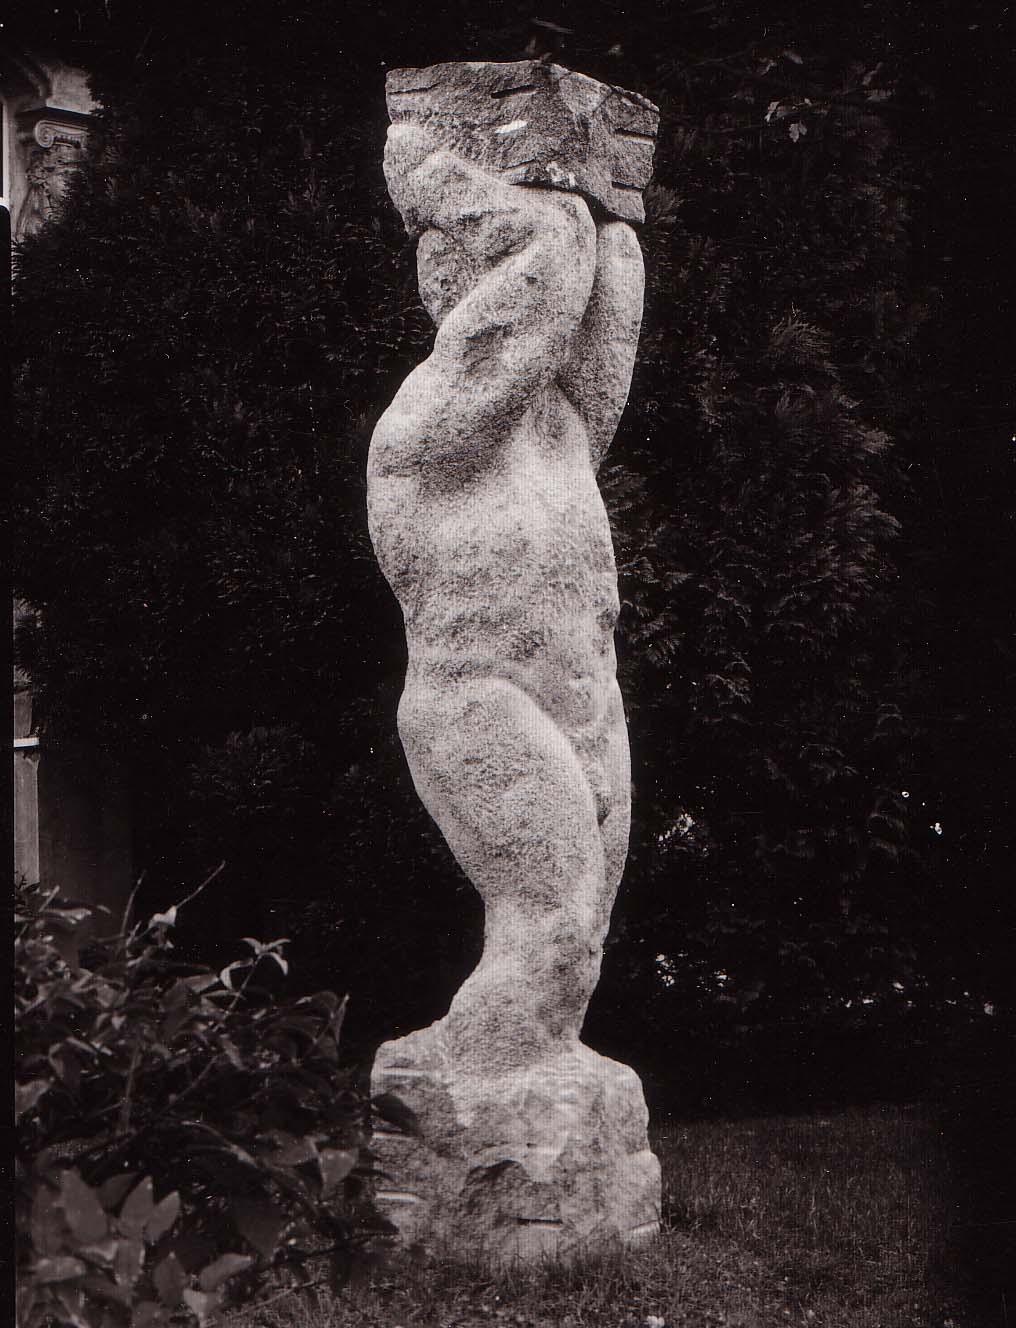 """Sisyphos"", Granit, 1989, Standort: Goethestraße 8, Lübeck"